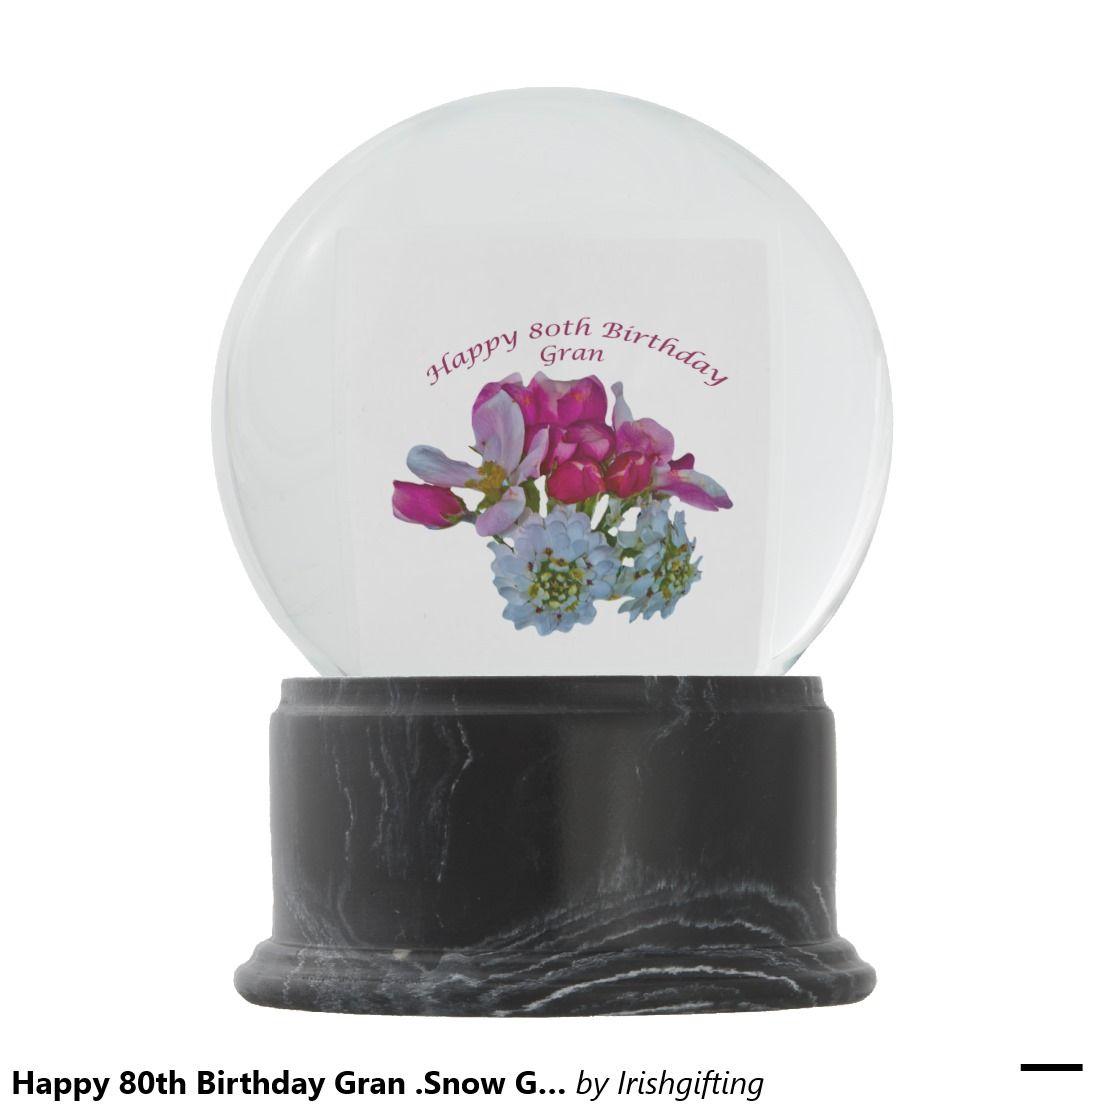 Happy 80th Birthday Gran .Snow Globes Snow Globes